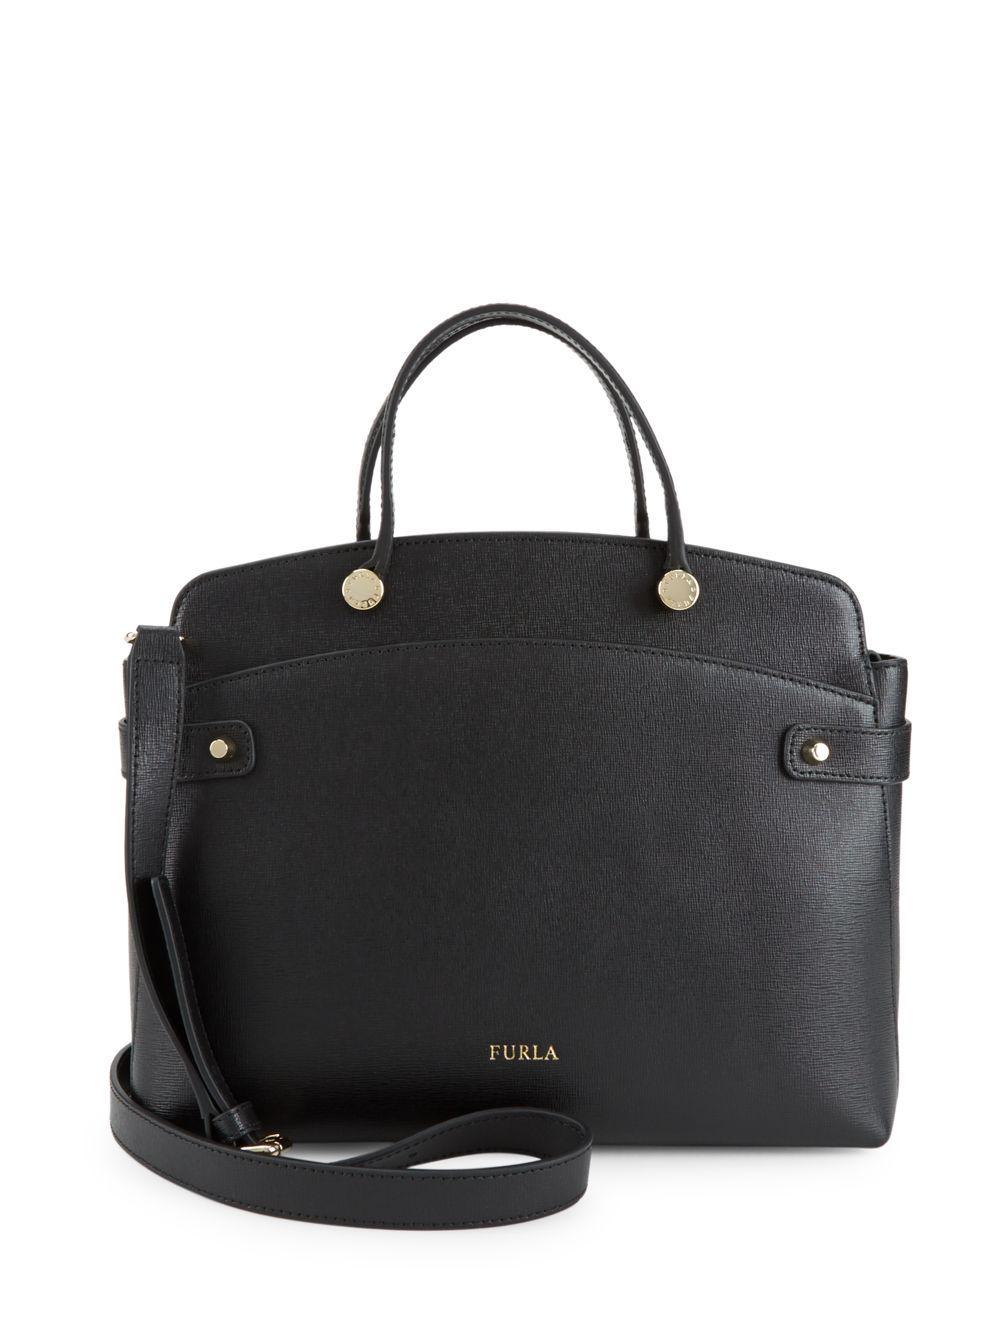 a8523c6f3d3b Furla Leather Top Zip Shoulder Bag | Stanford Center for Opportunity ...